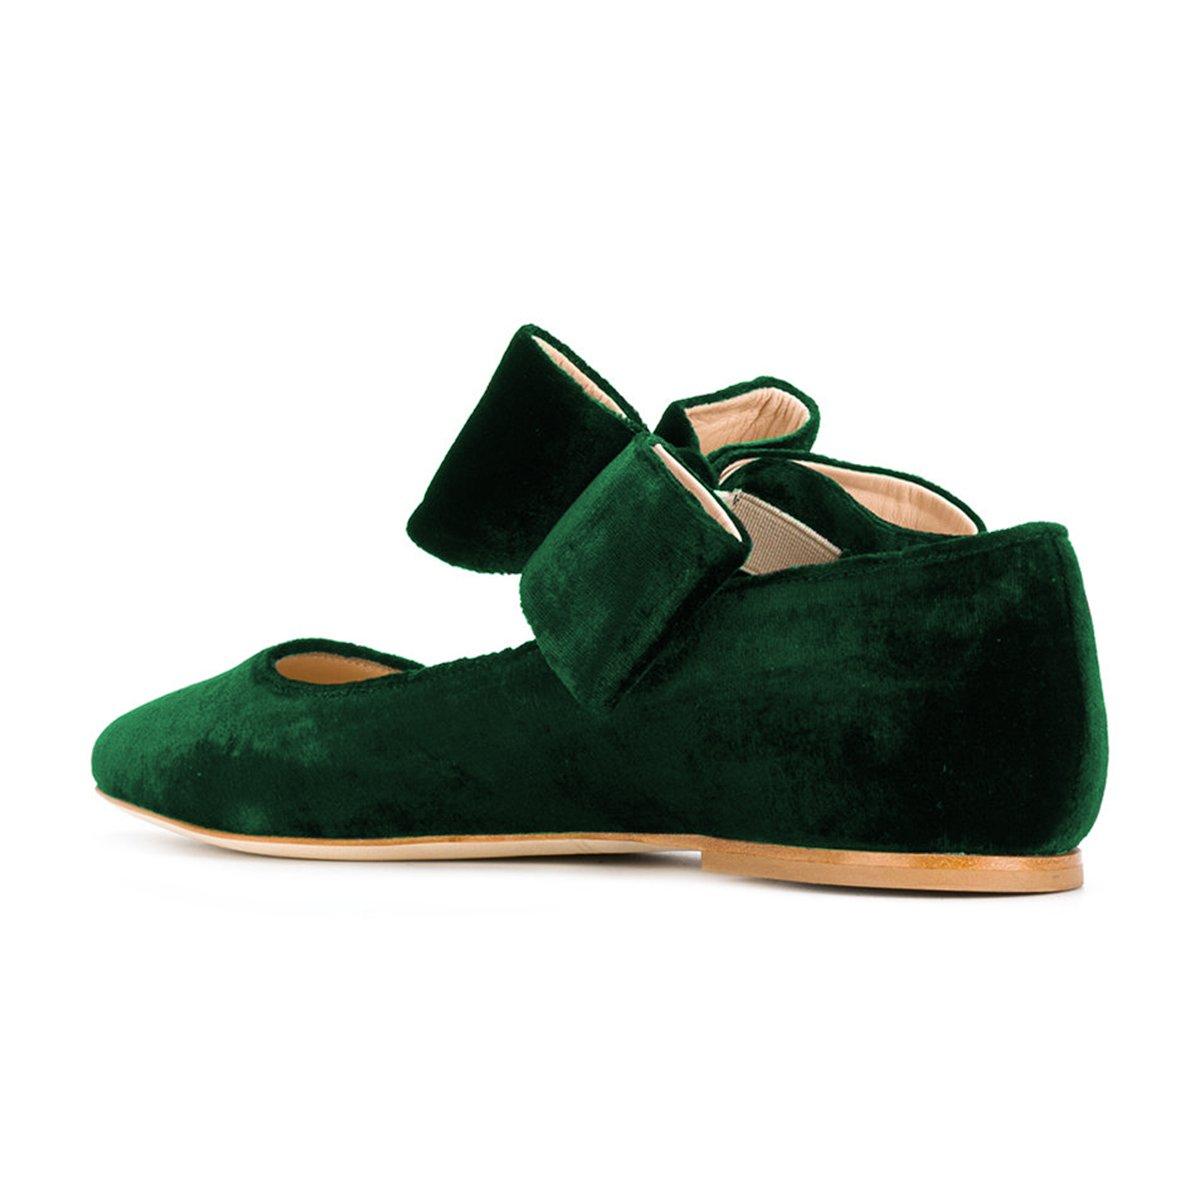 FSJ Women Cute Pointed Toe Flats With Bowknot Velvet Low Heels Slip On Comfy Shoes Size 4-15 US B076Q9K31Z 6 B(M) US|Green